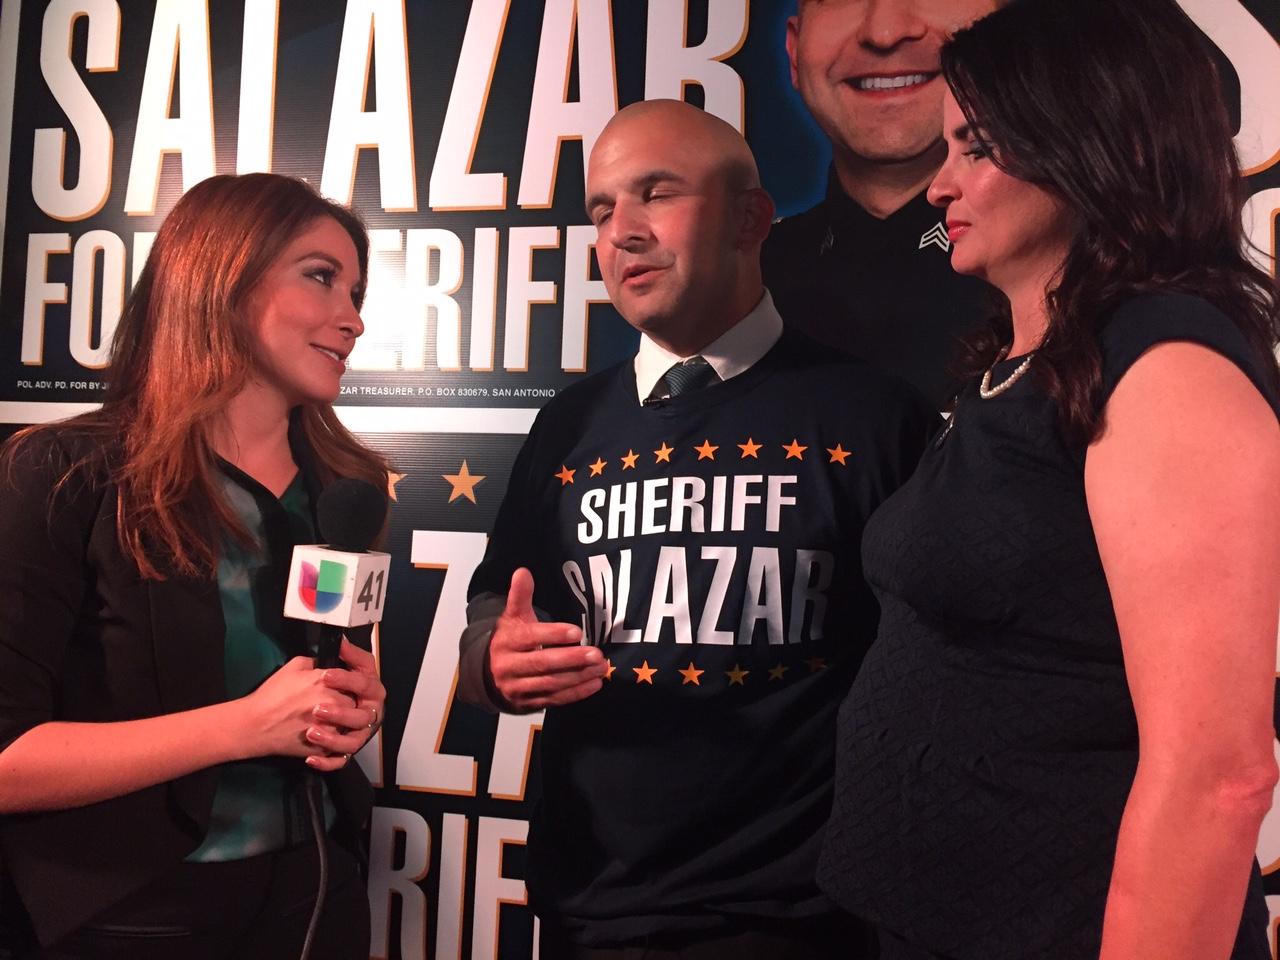 Javier Salazar speaks to a reporter after he surpasses Sheriff Pamerleau.